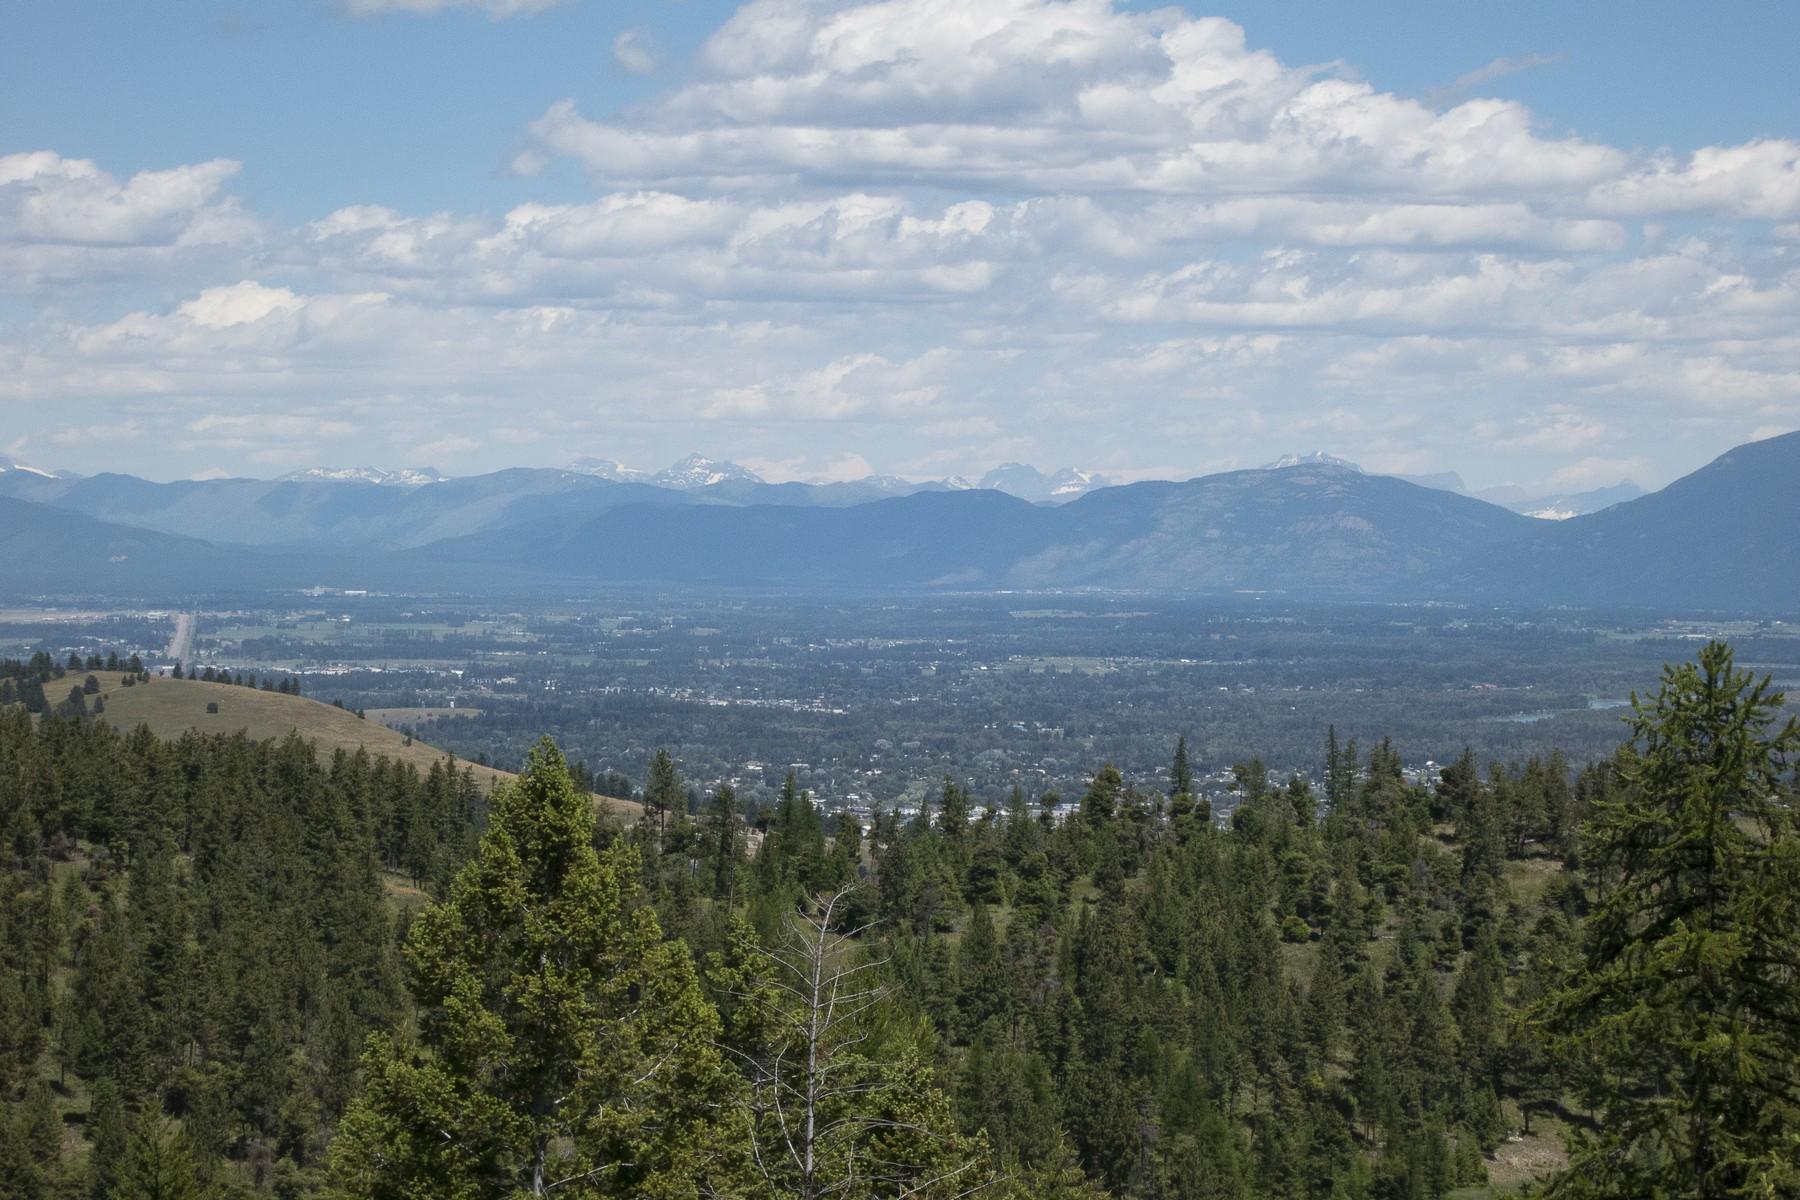 Land voor Verkoop op Emmons Canyon Acreage Nhn Emmons Canyon Road, Kalispell, Montana 59901 Verenigde Staten